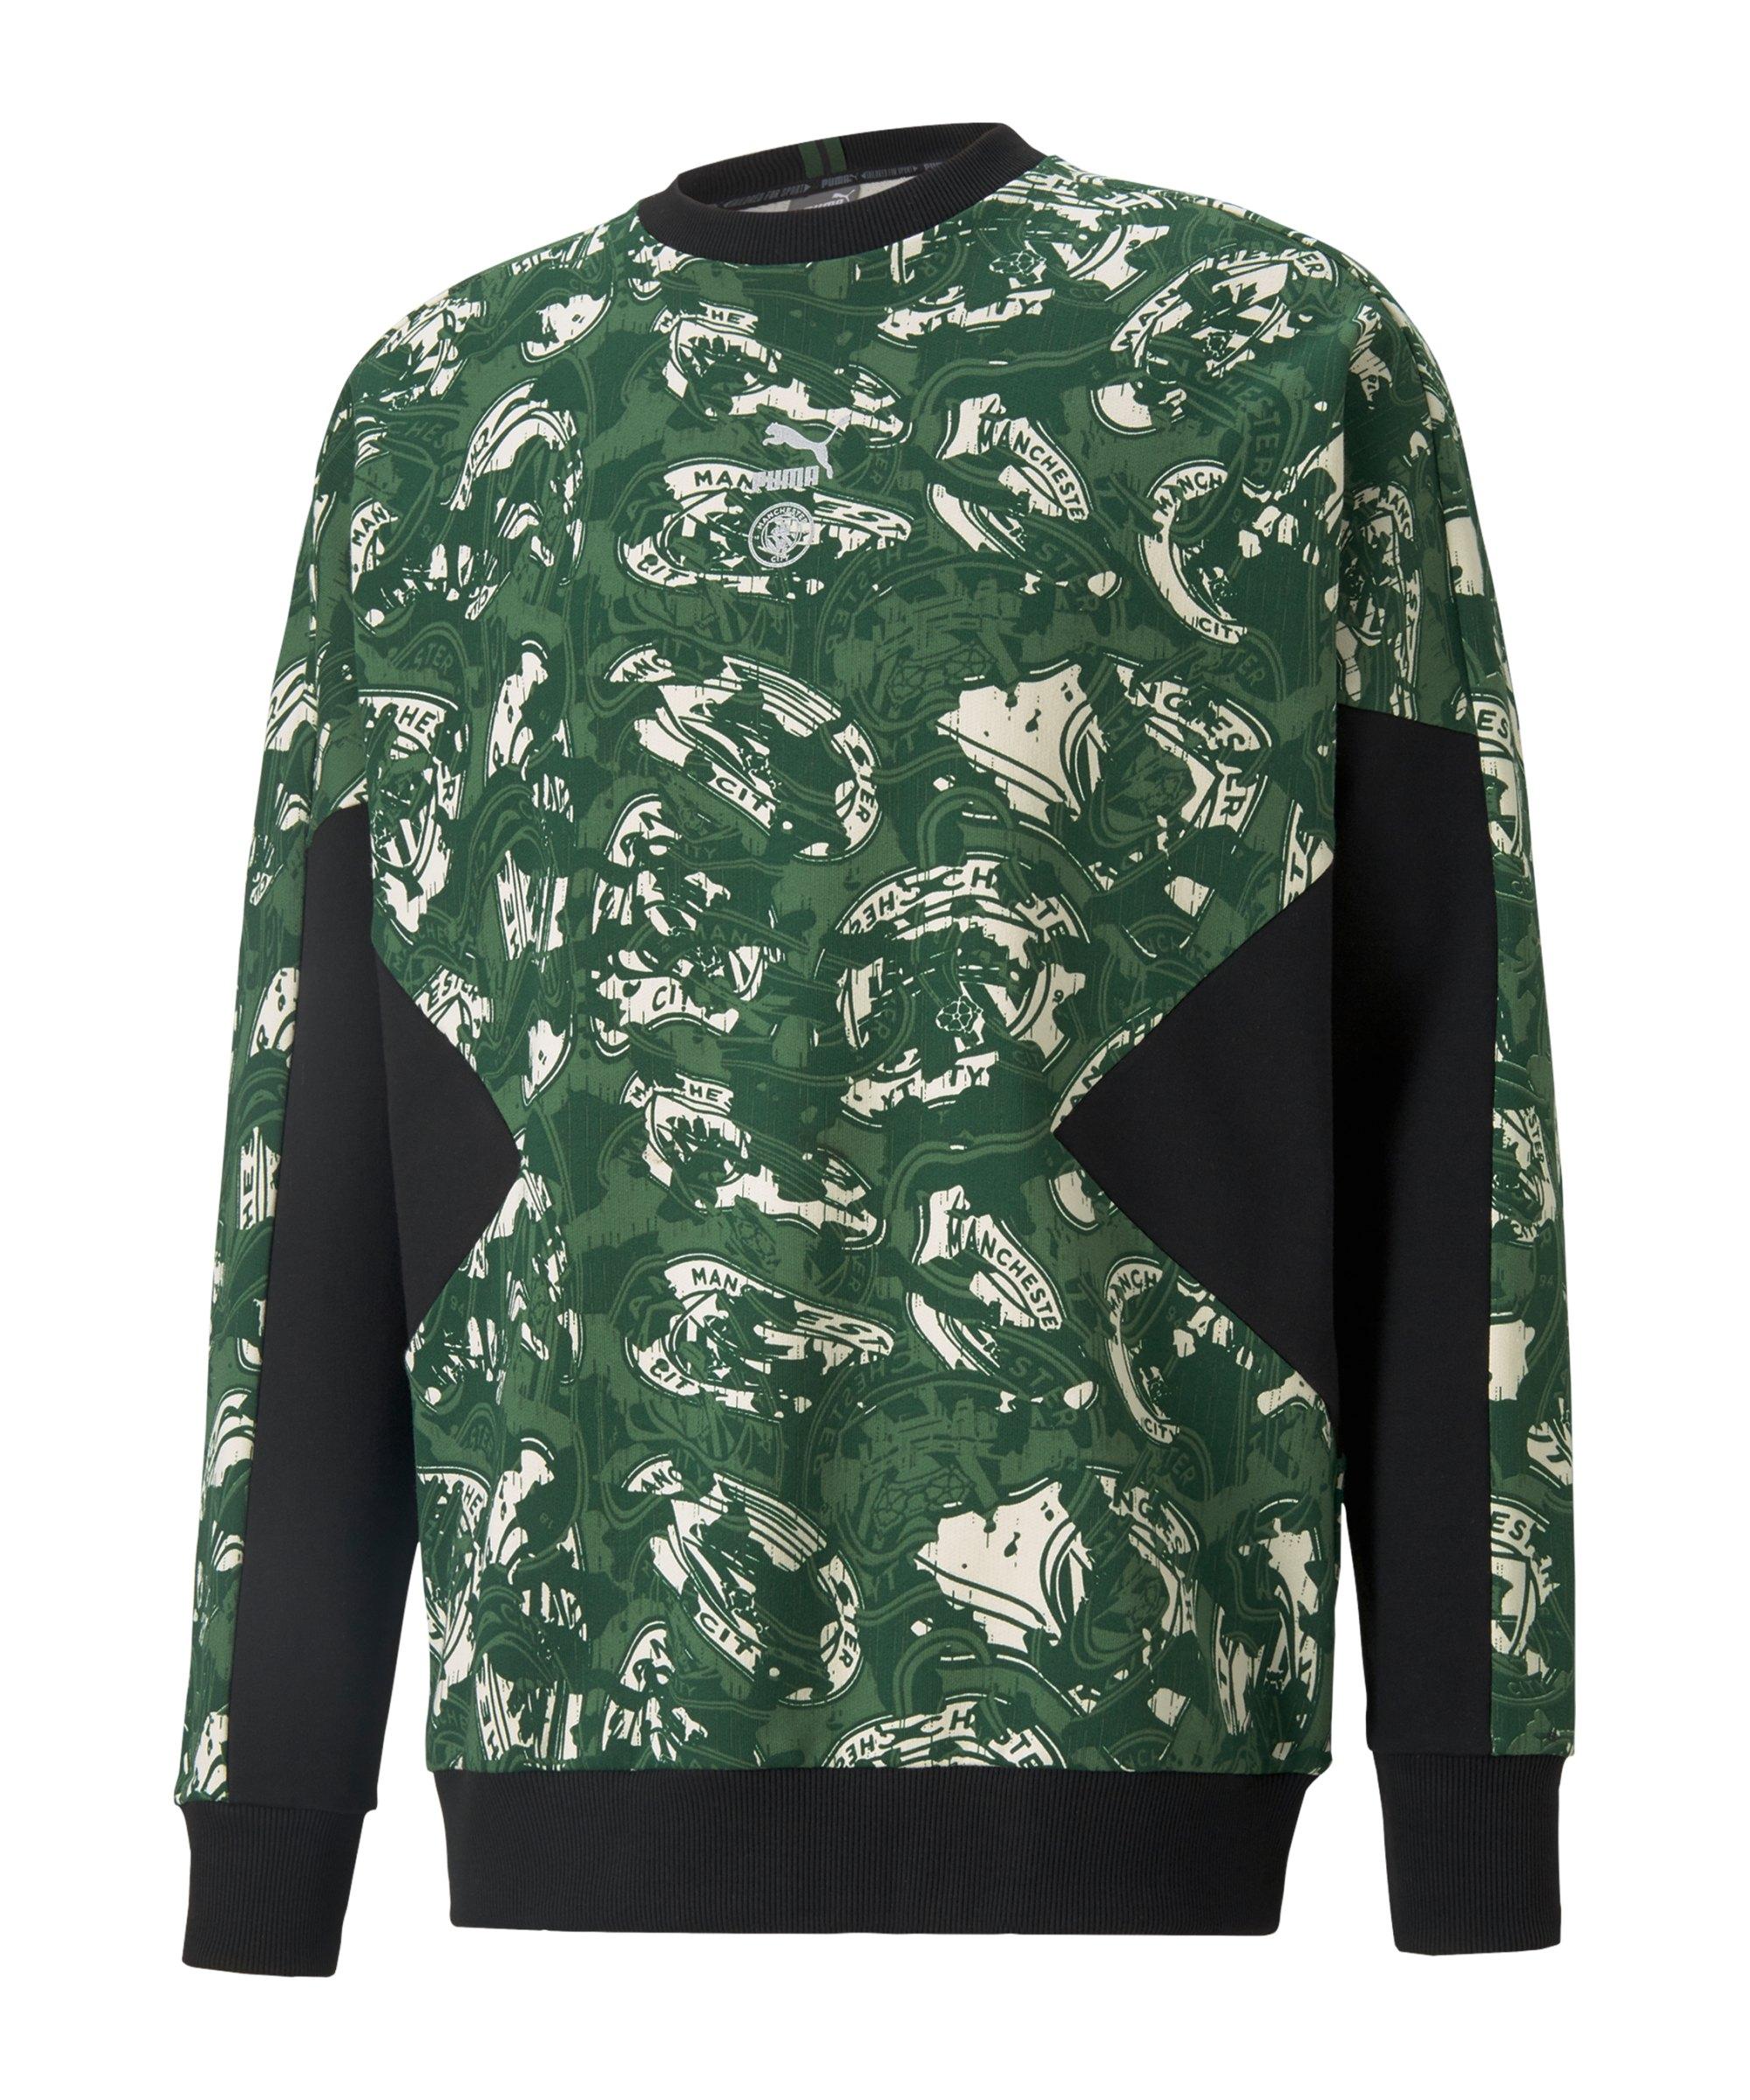 PUMA Manchester City TFS Sweatshirt Grün Schwarz F10 - gruen